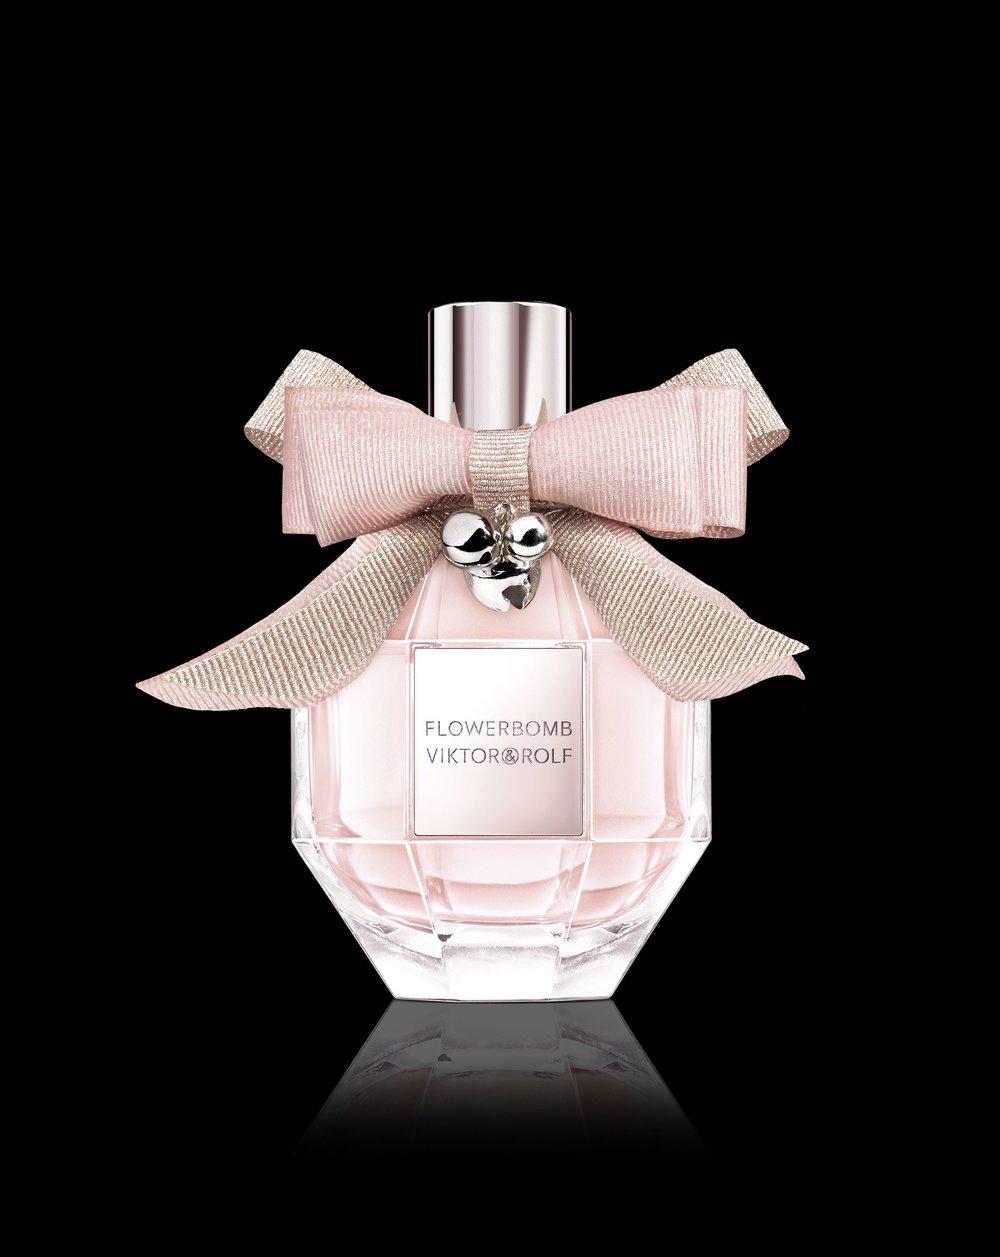 flowerbomb_eau_de_parfum_christmas_edition_2018_-_1_packshot.jpg